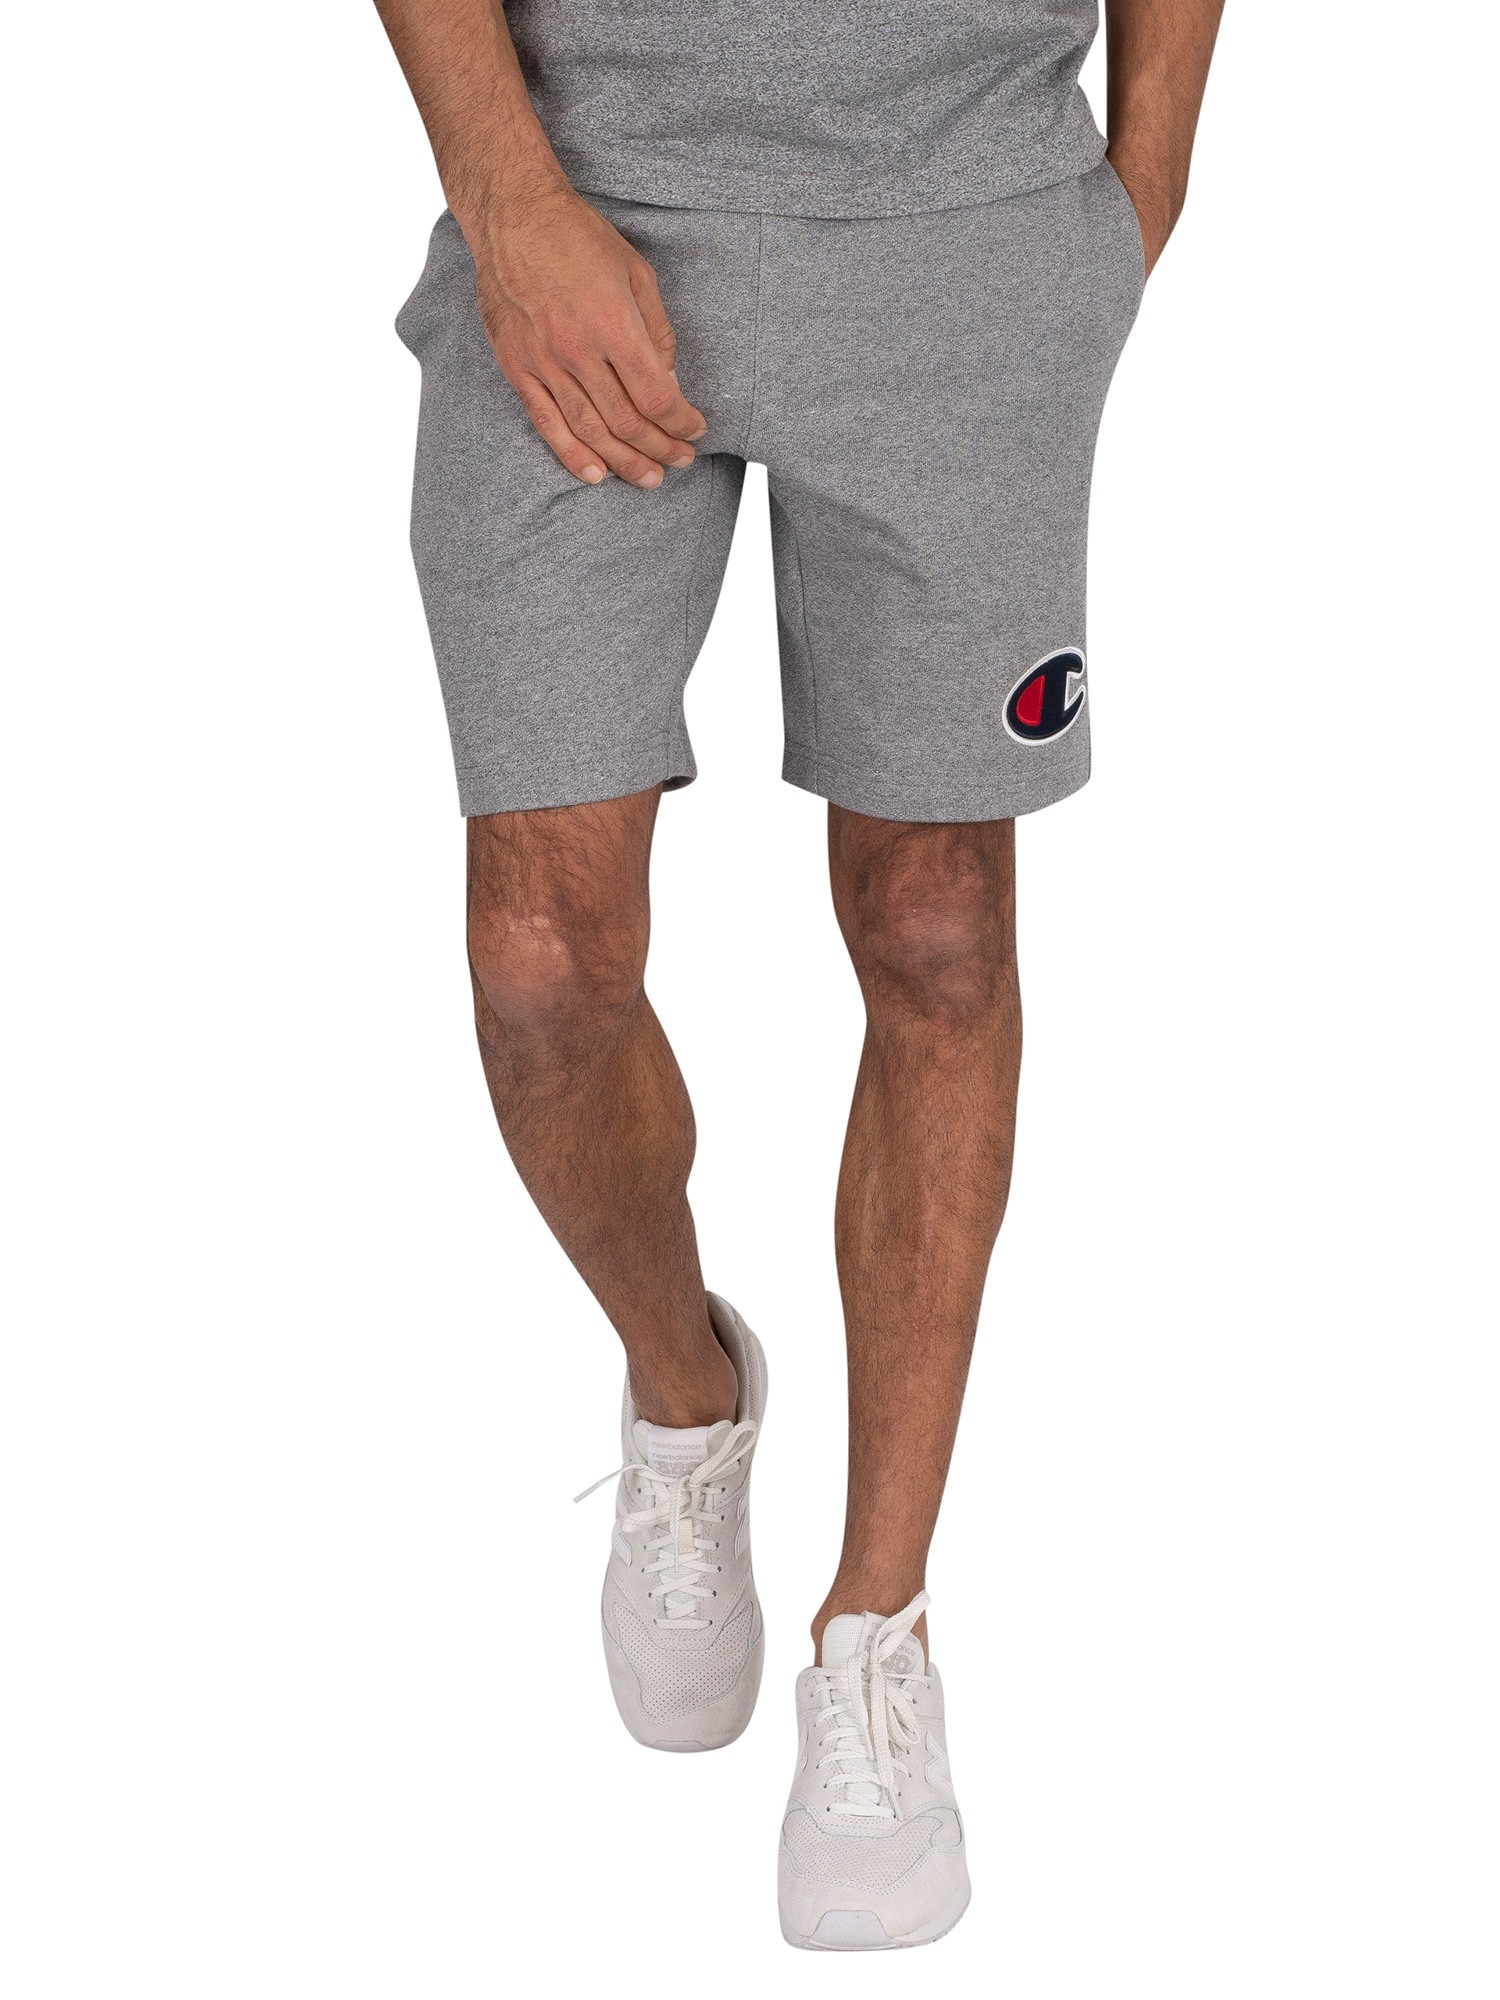 Fleece Shorts Champion Men/'s Powerblend C Logo Pockets Black Navy Grey 10 Inseam